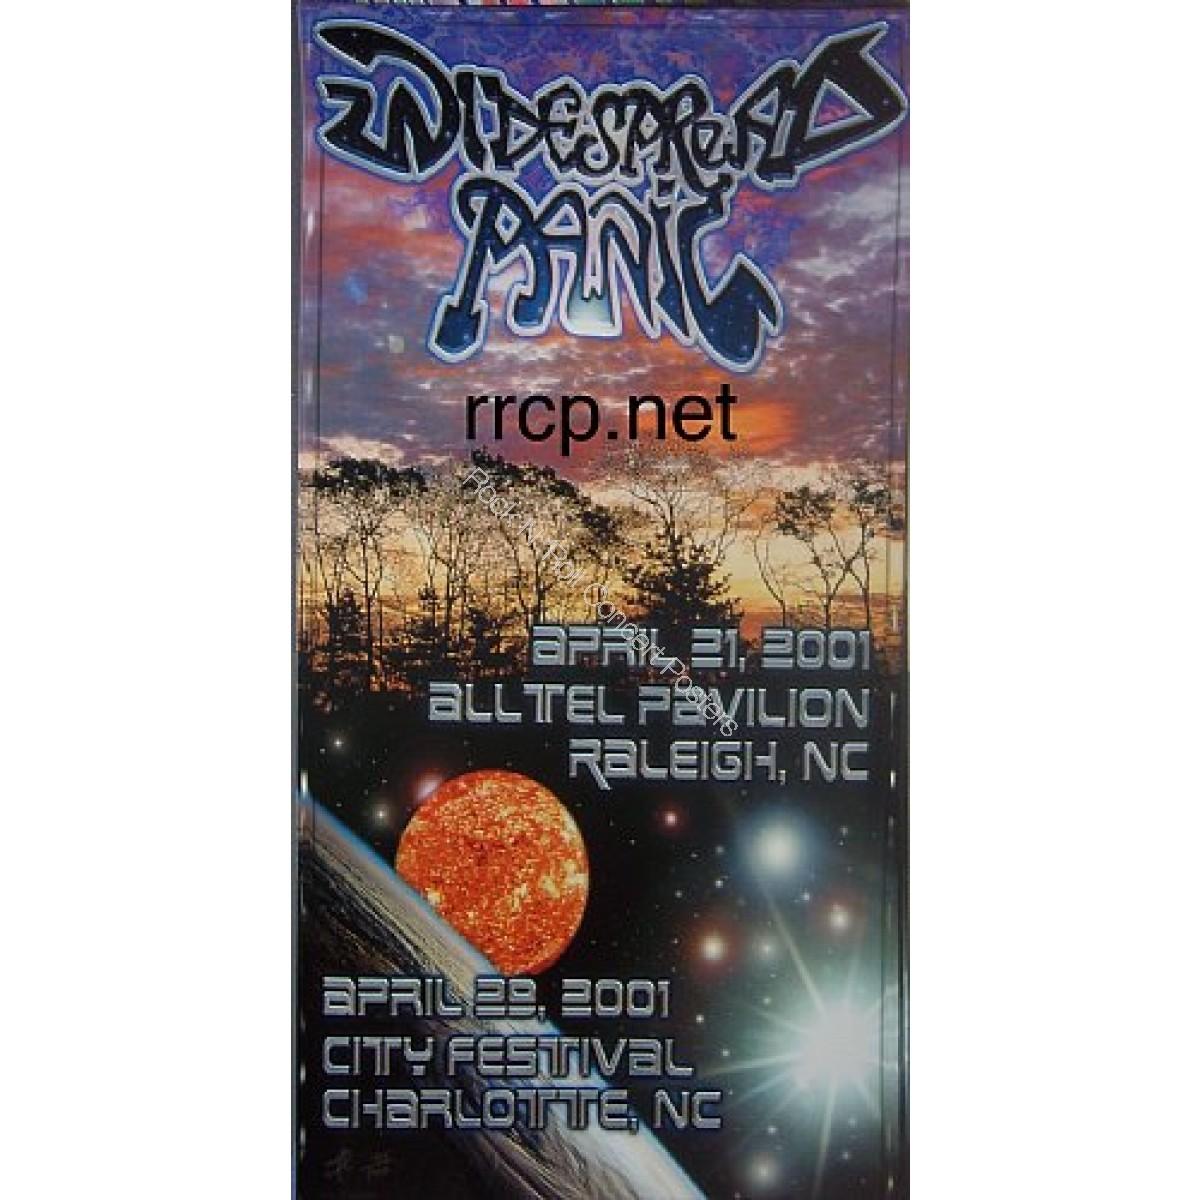 Widespread Panic Raleigh, Charlotte  NC4/21/01